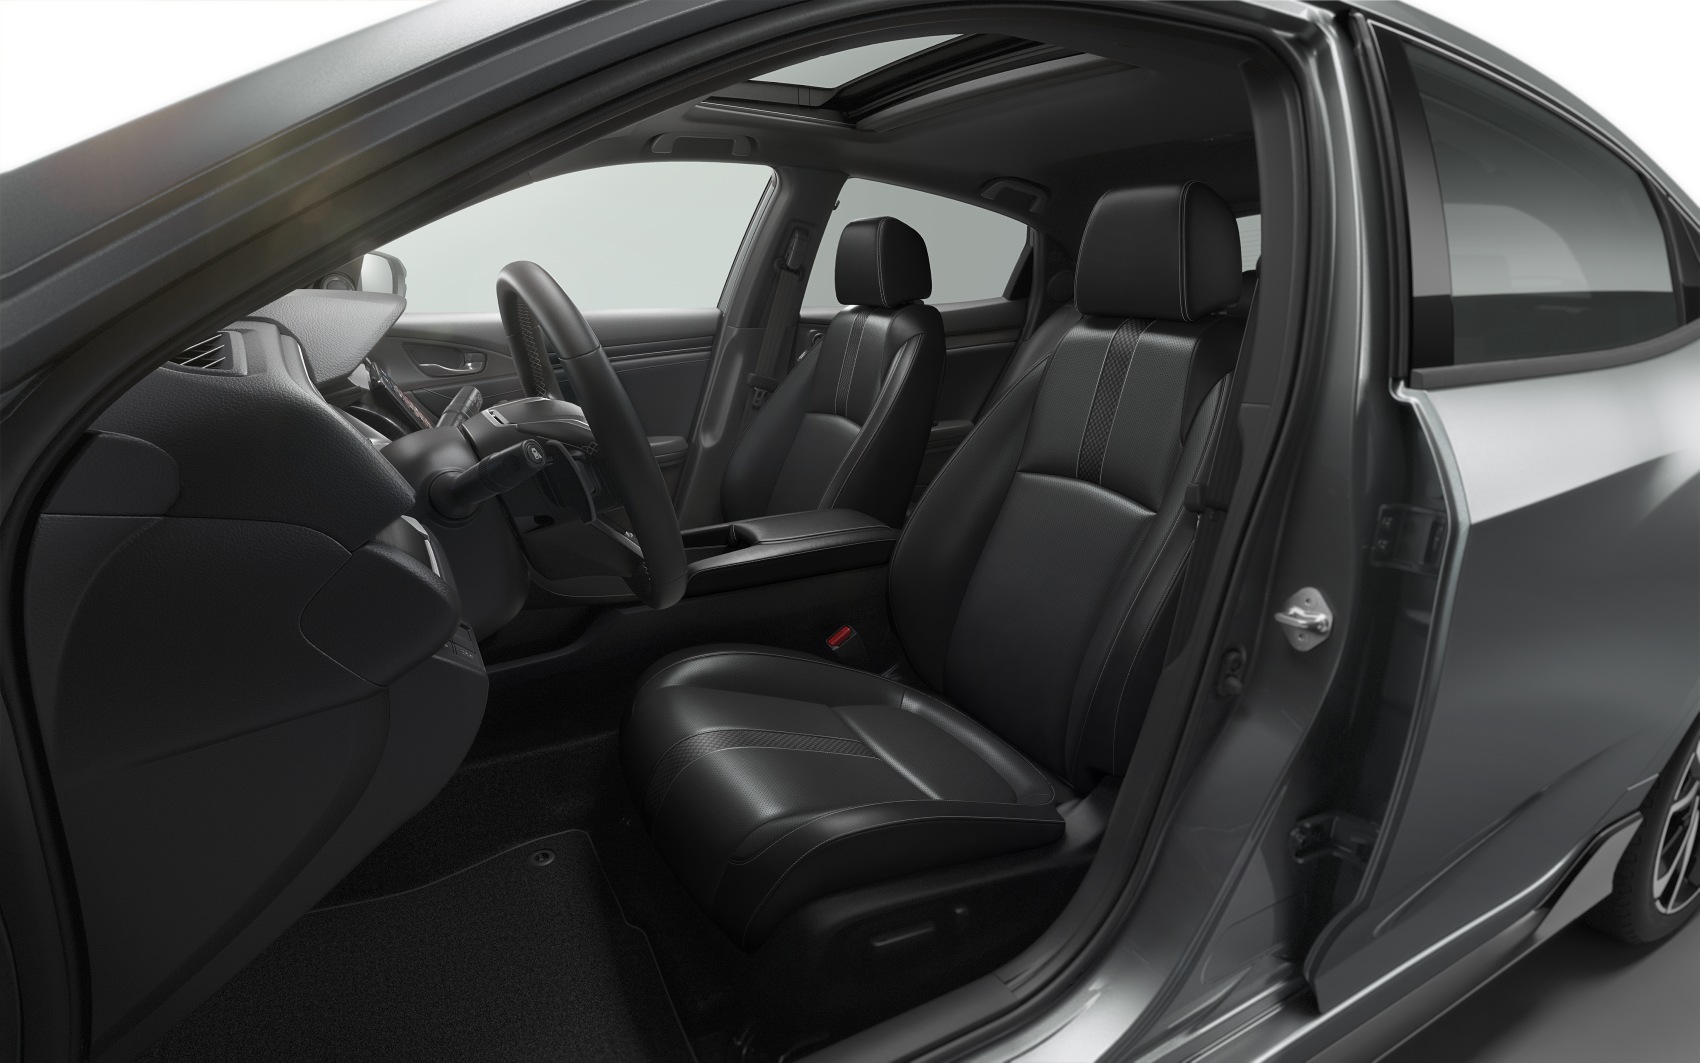 2021 Honda Civic Sport Interior Cabin Space